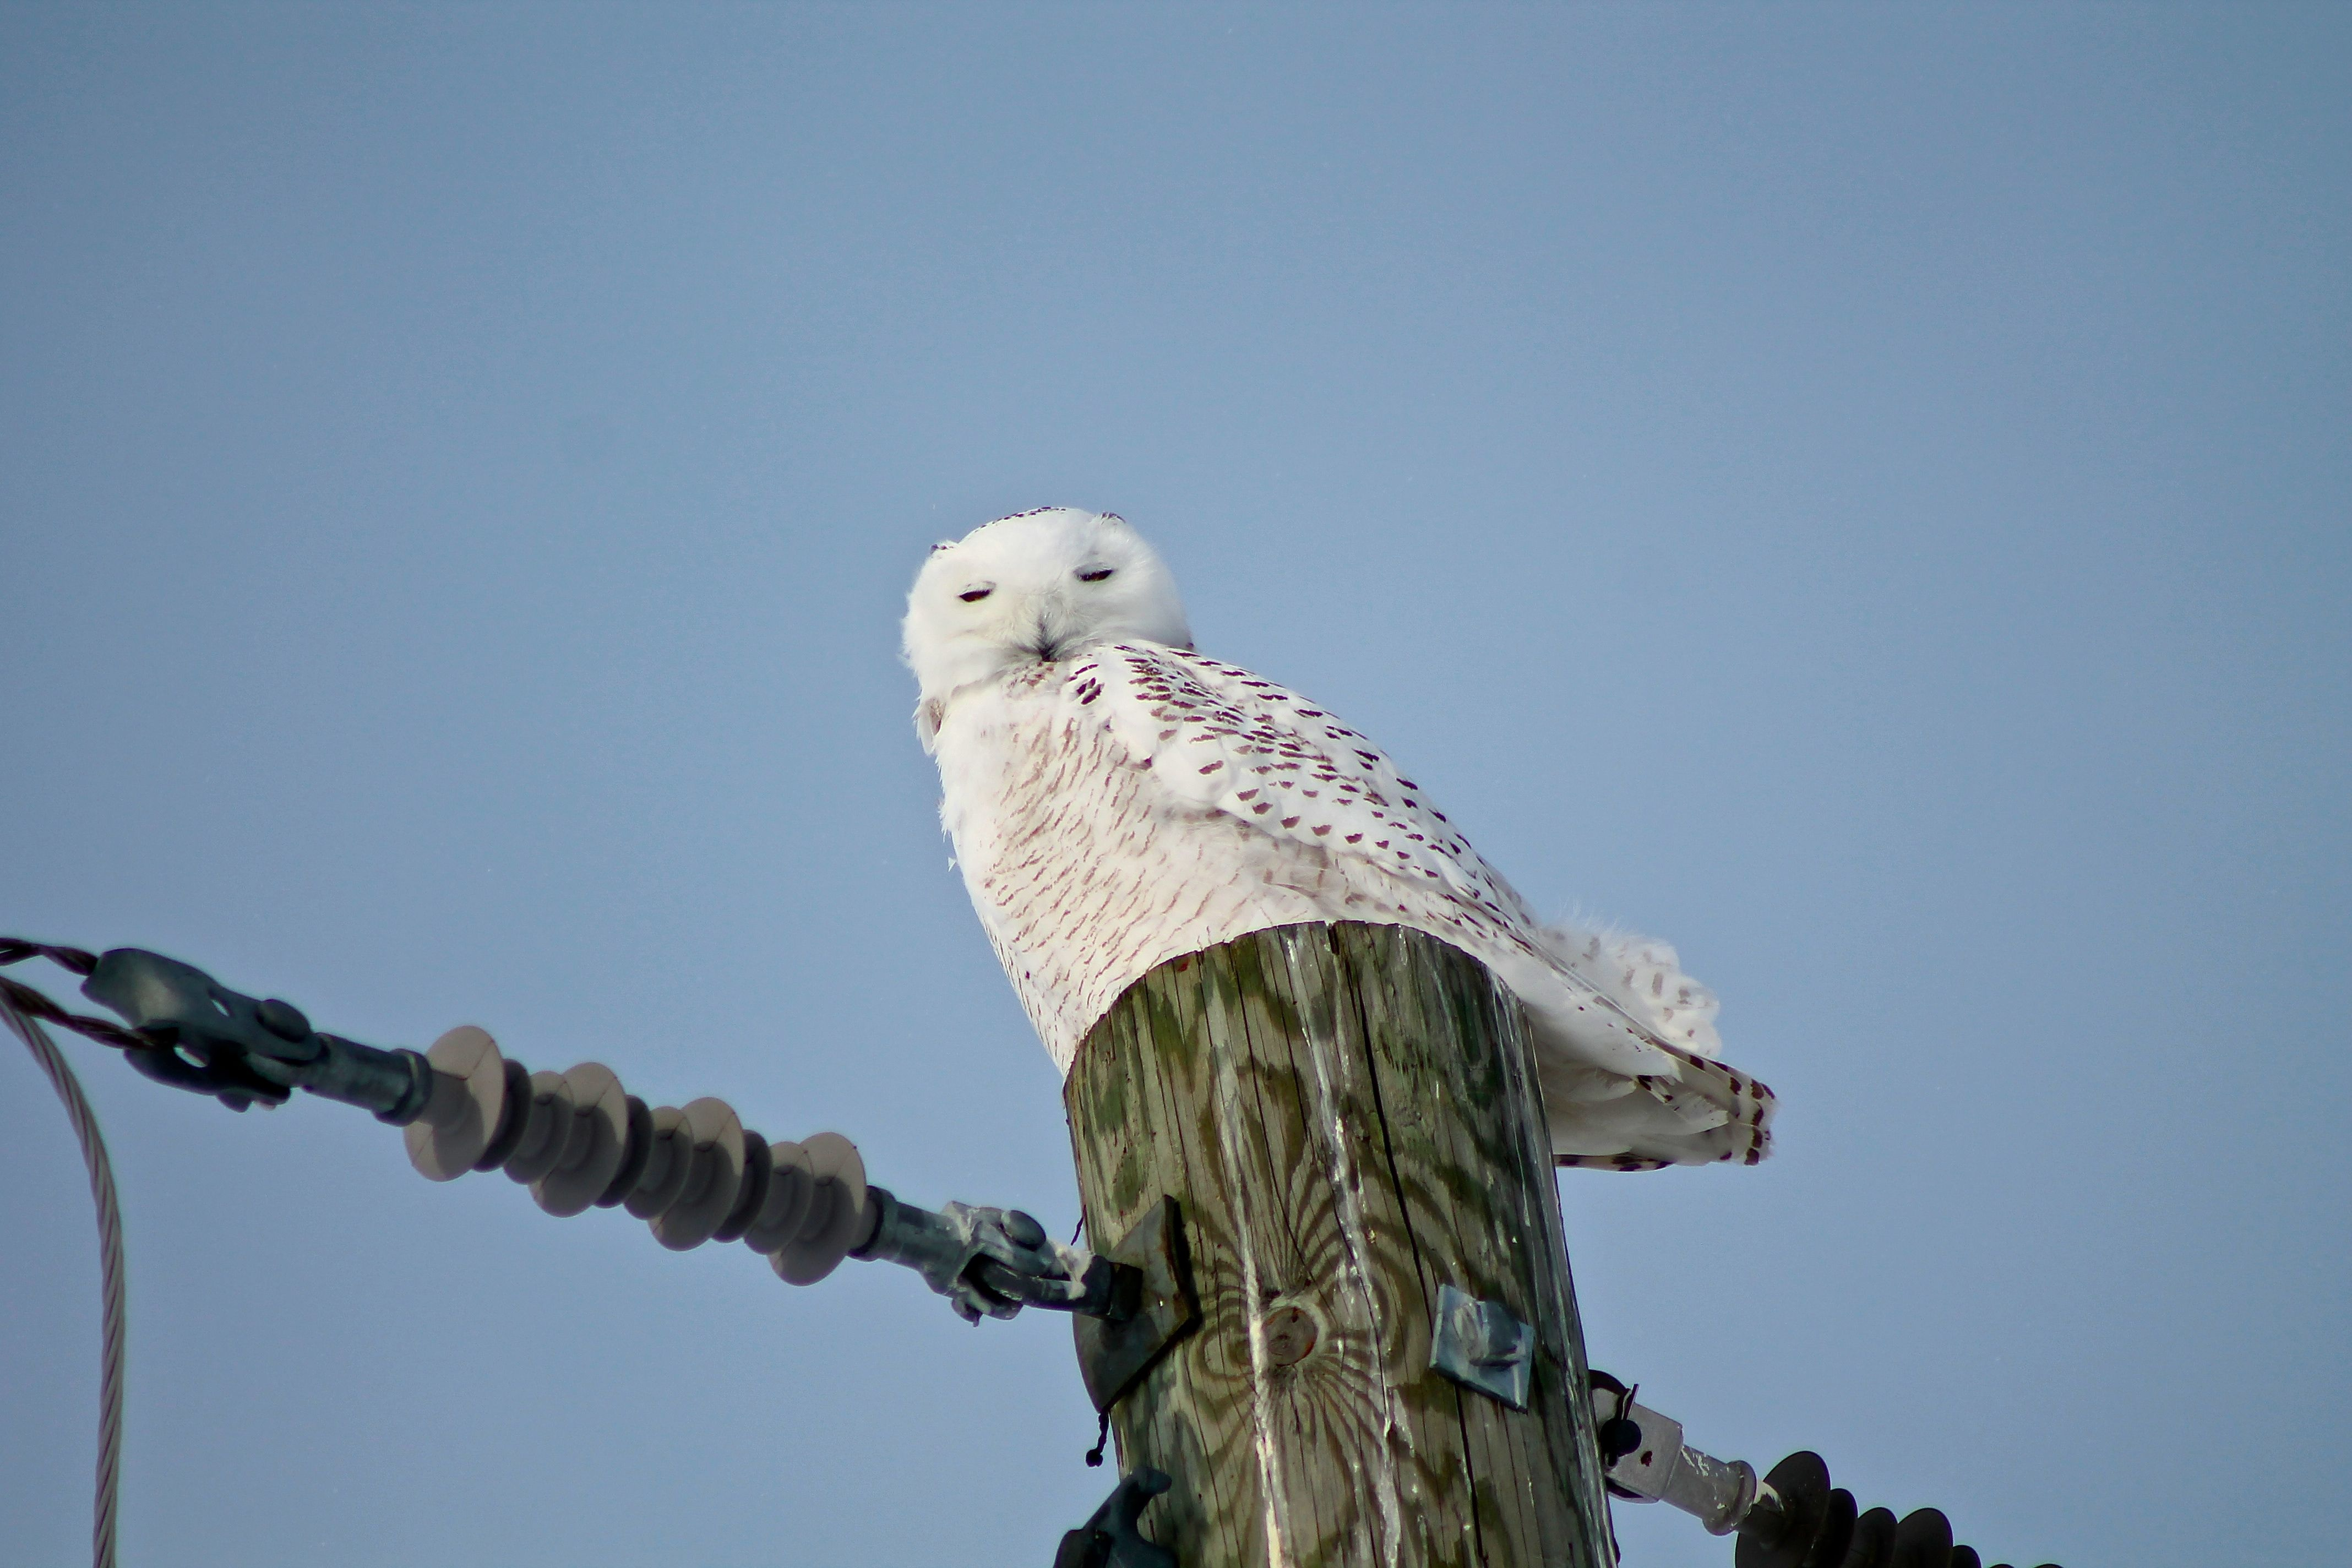 Snowy Owl - Napanee, Ontario - January 2014.